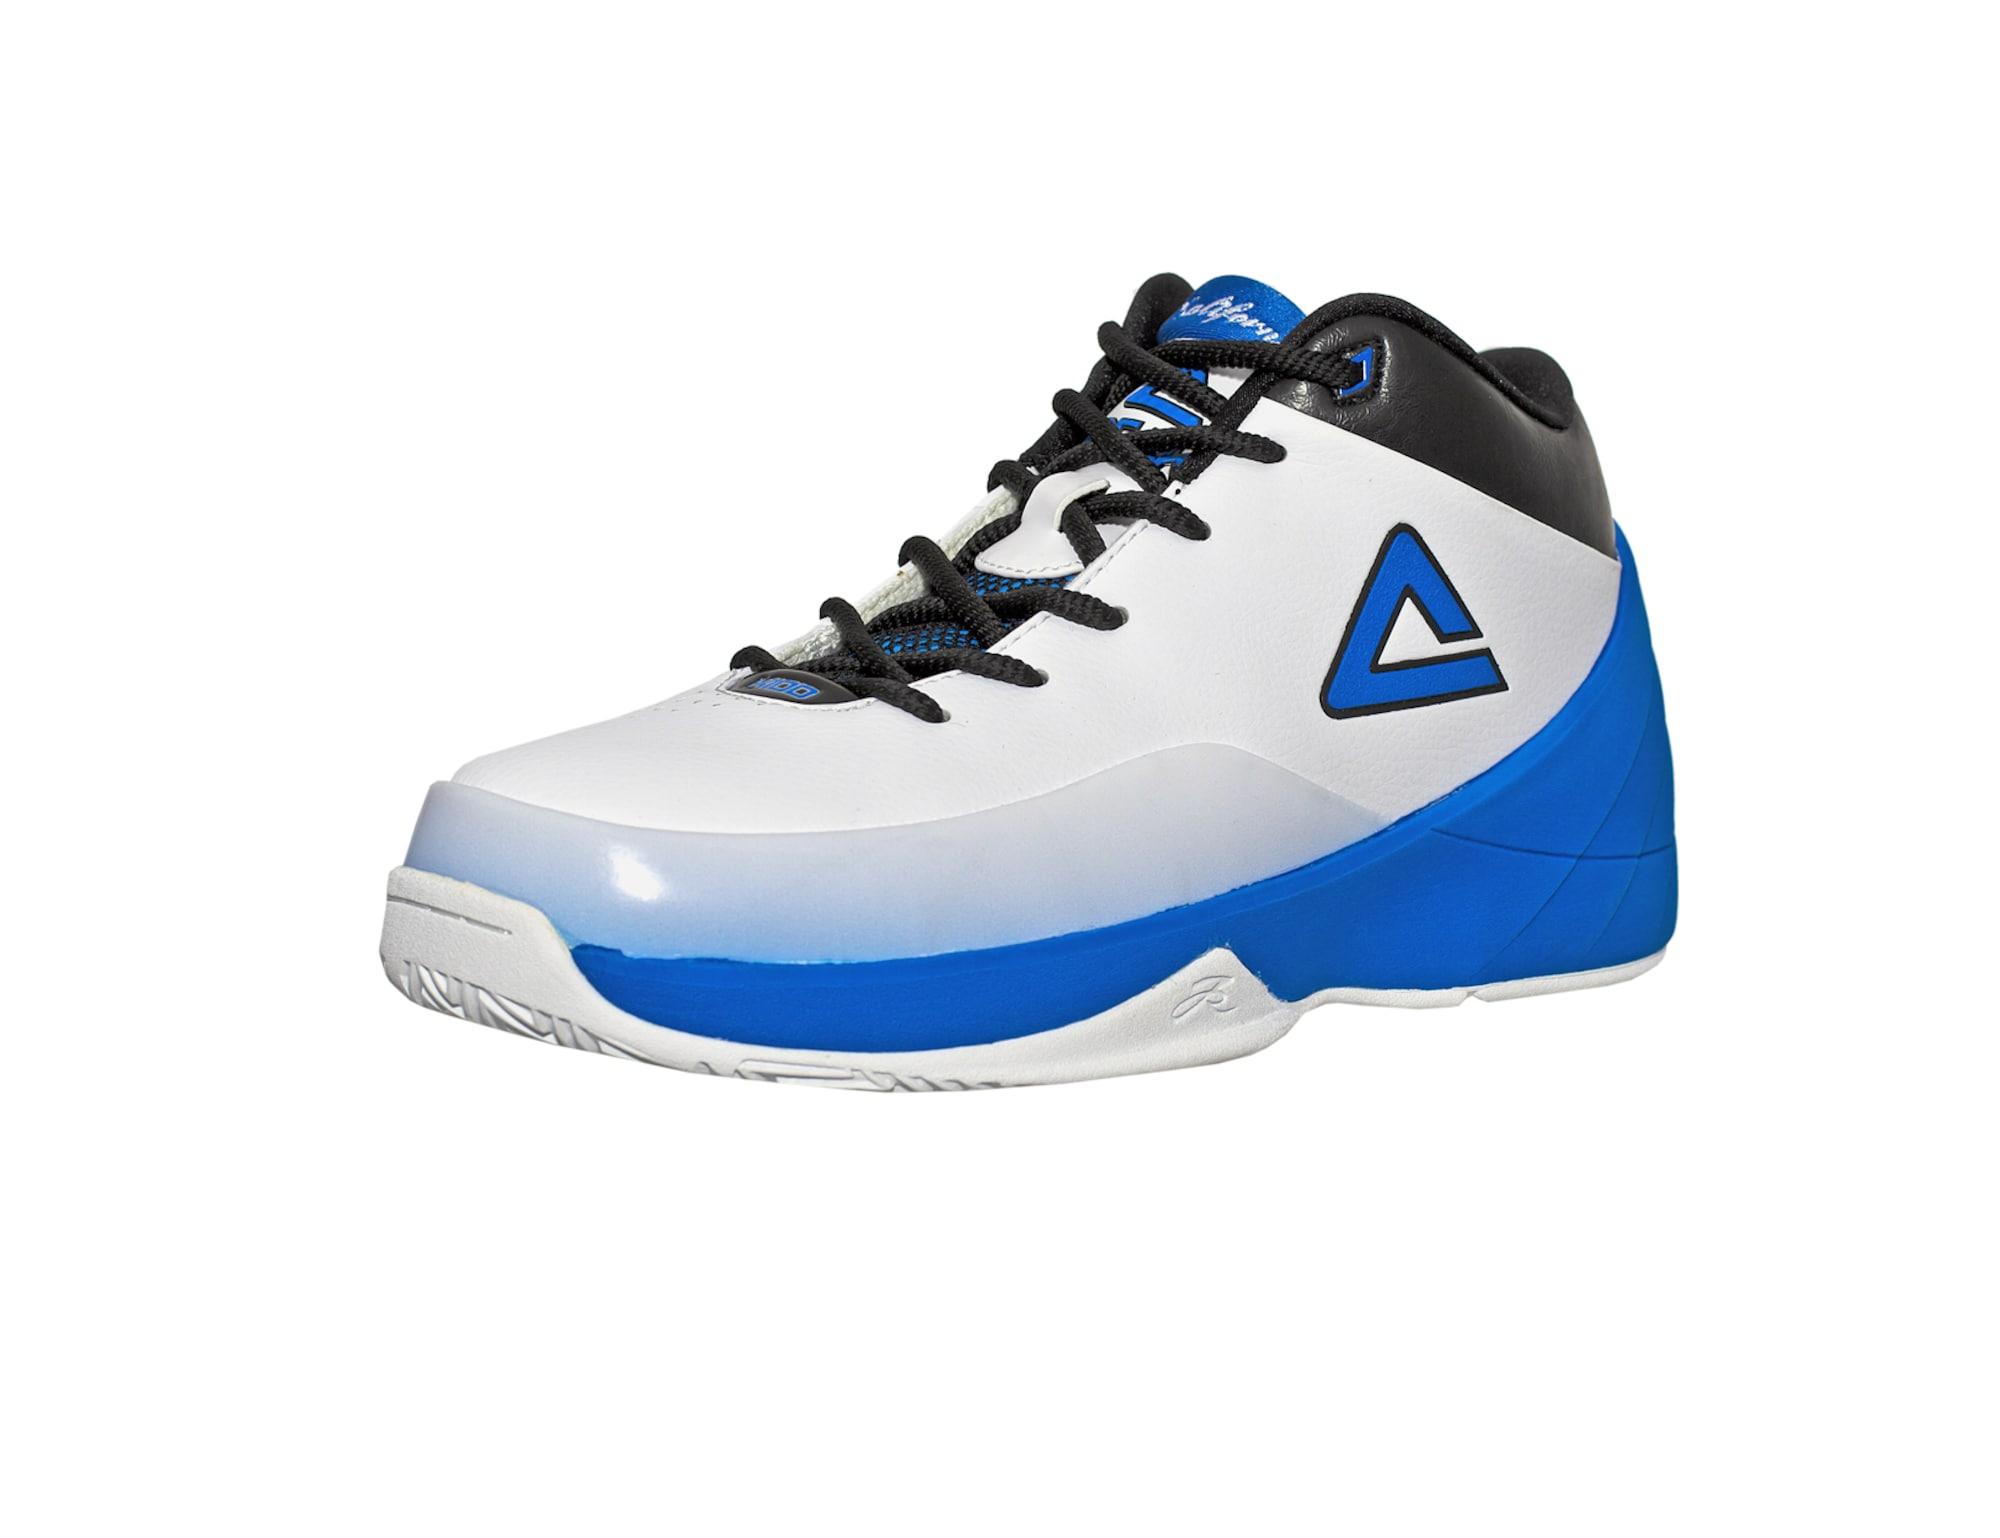 Basketballschuh 'Jason Kidd III Signature' | Schuhe > Sportschuhe > Basketballschuhe | Peak